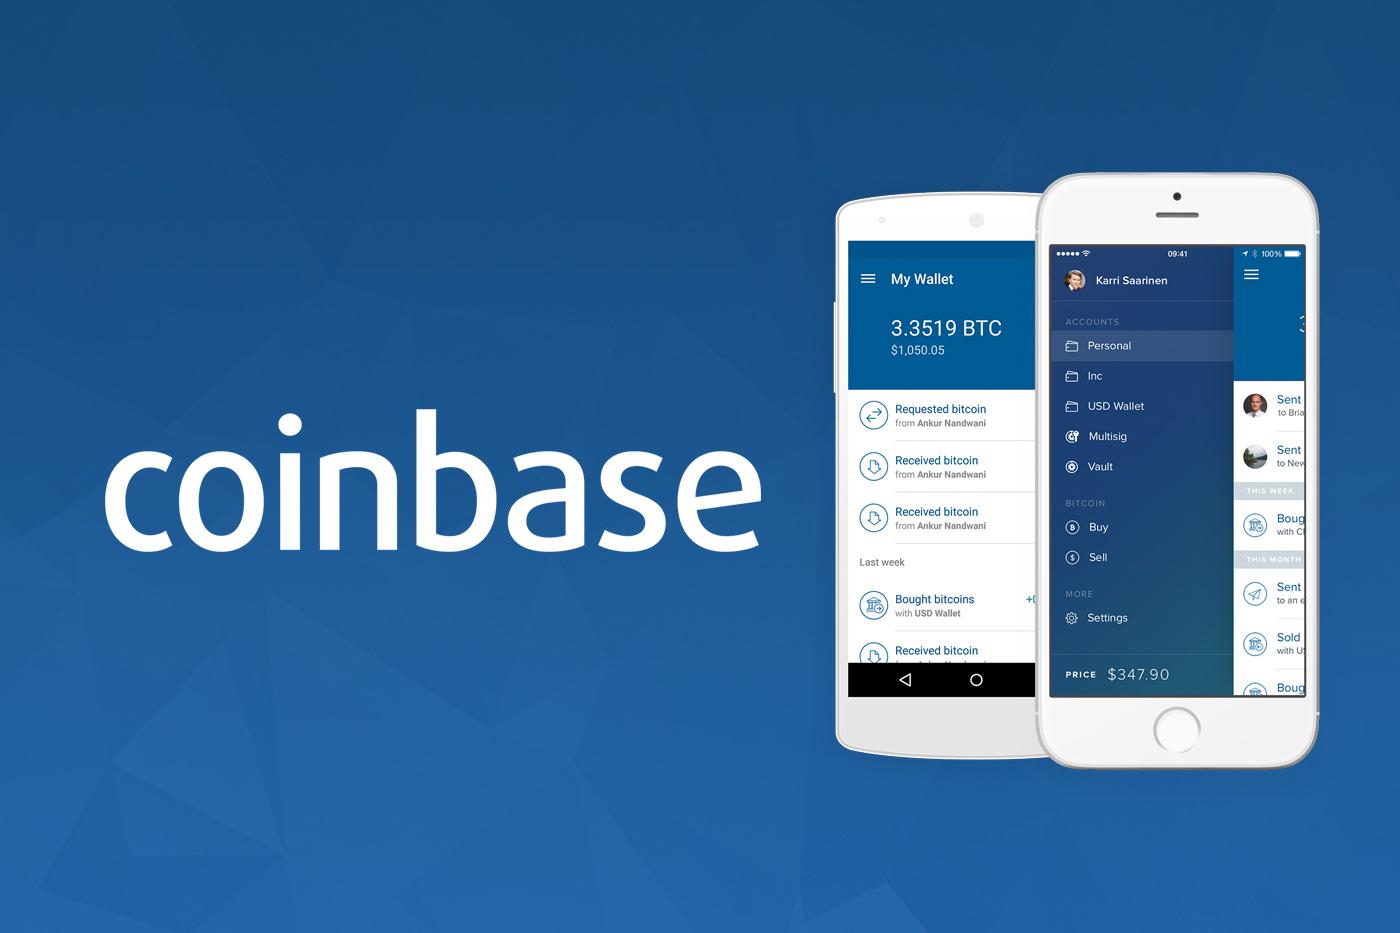 coinbase-review.jpg